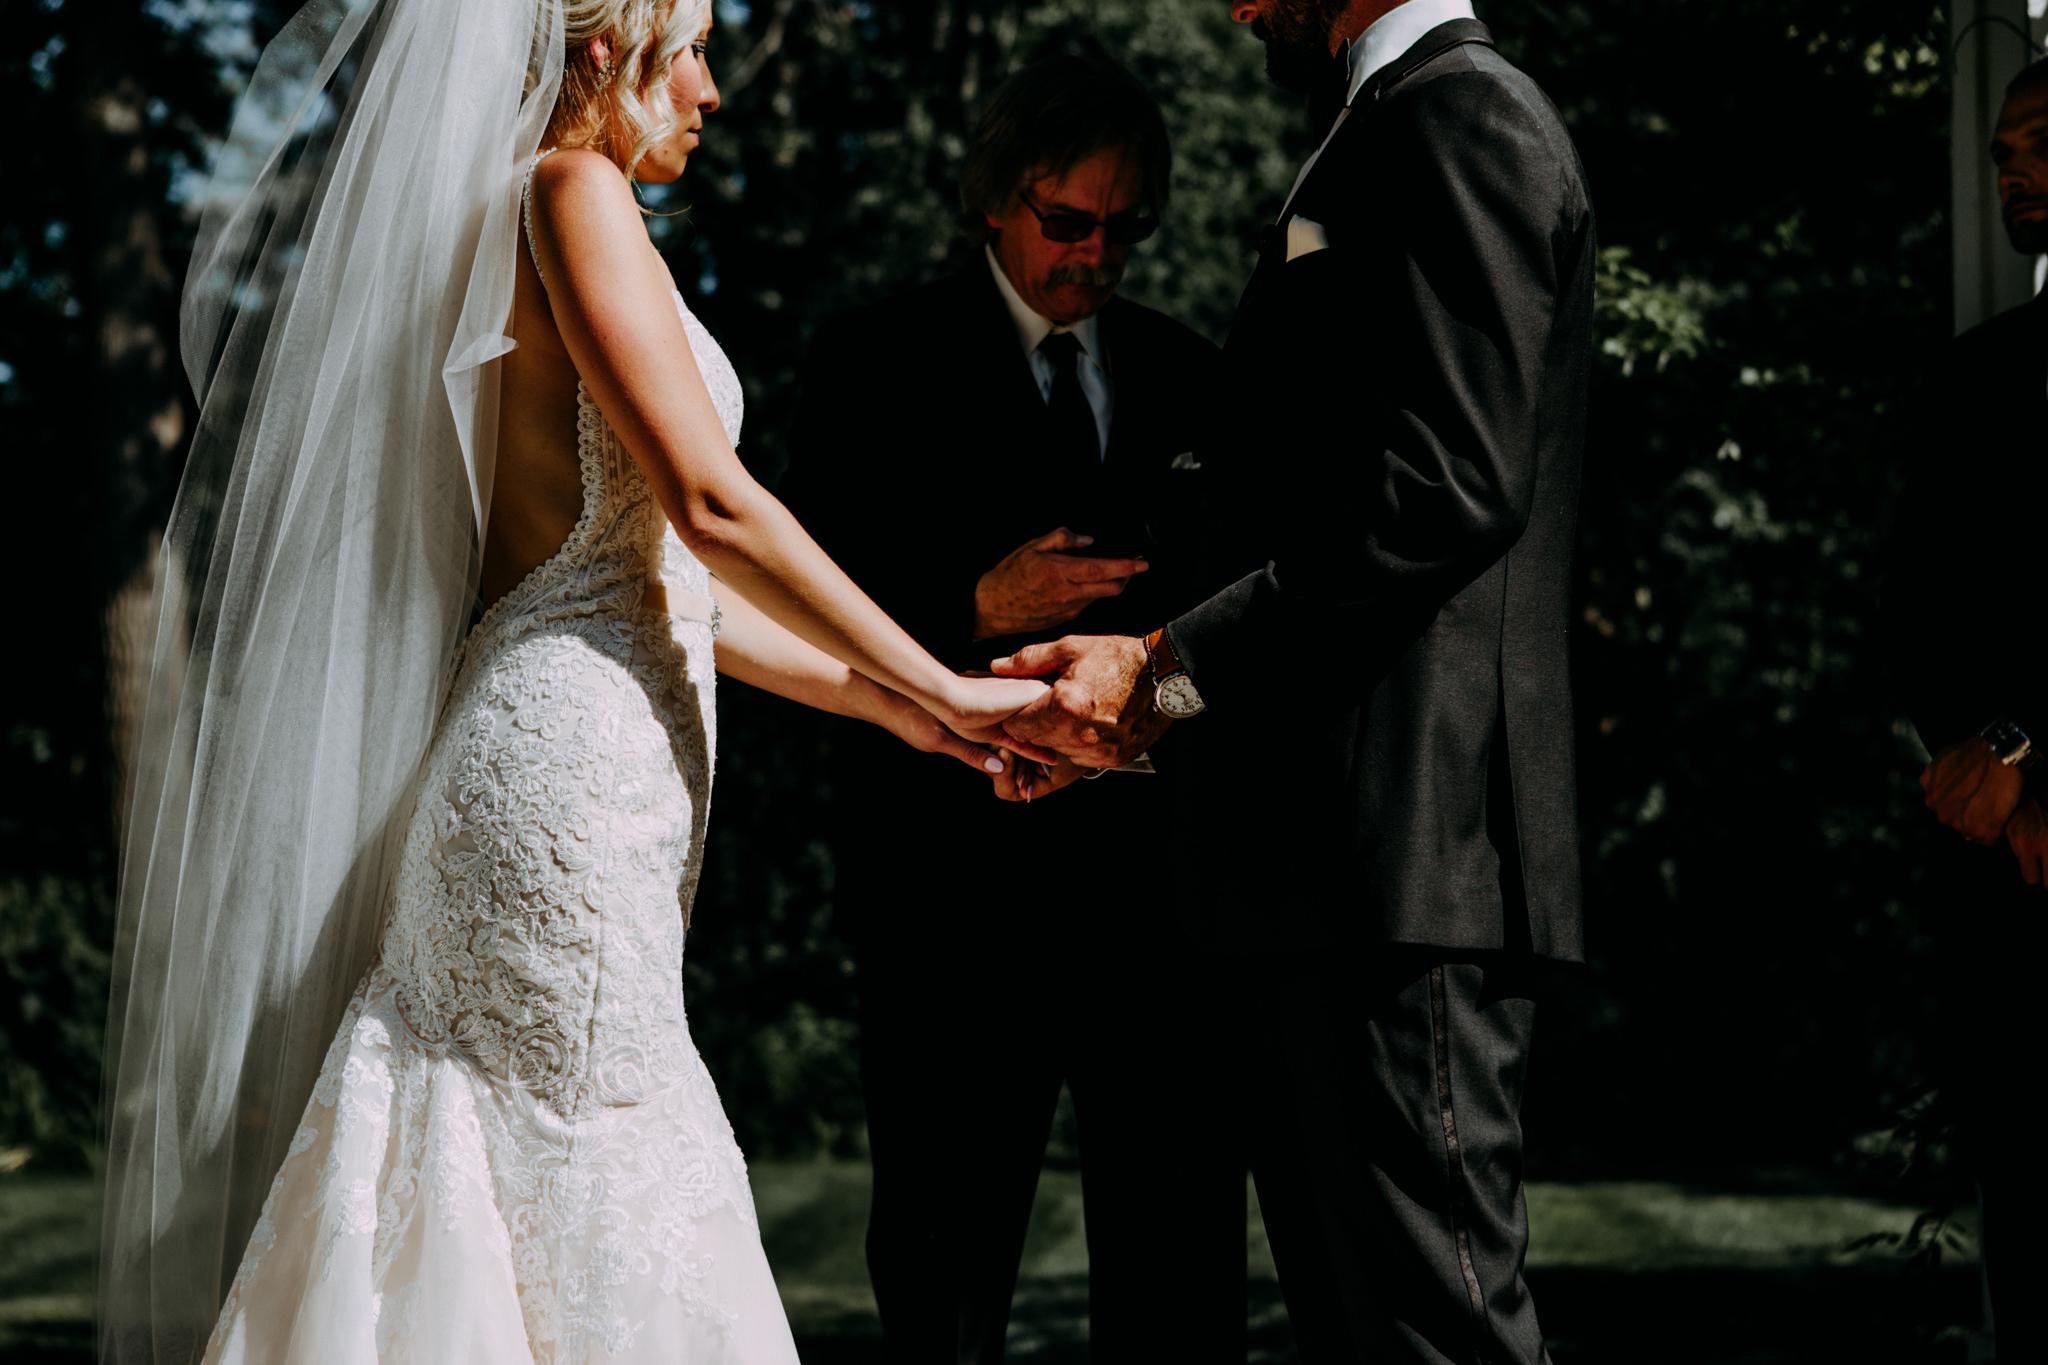 wellers in weddings in saline